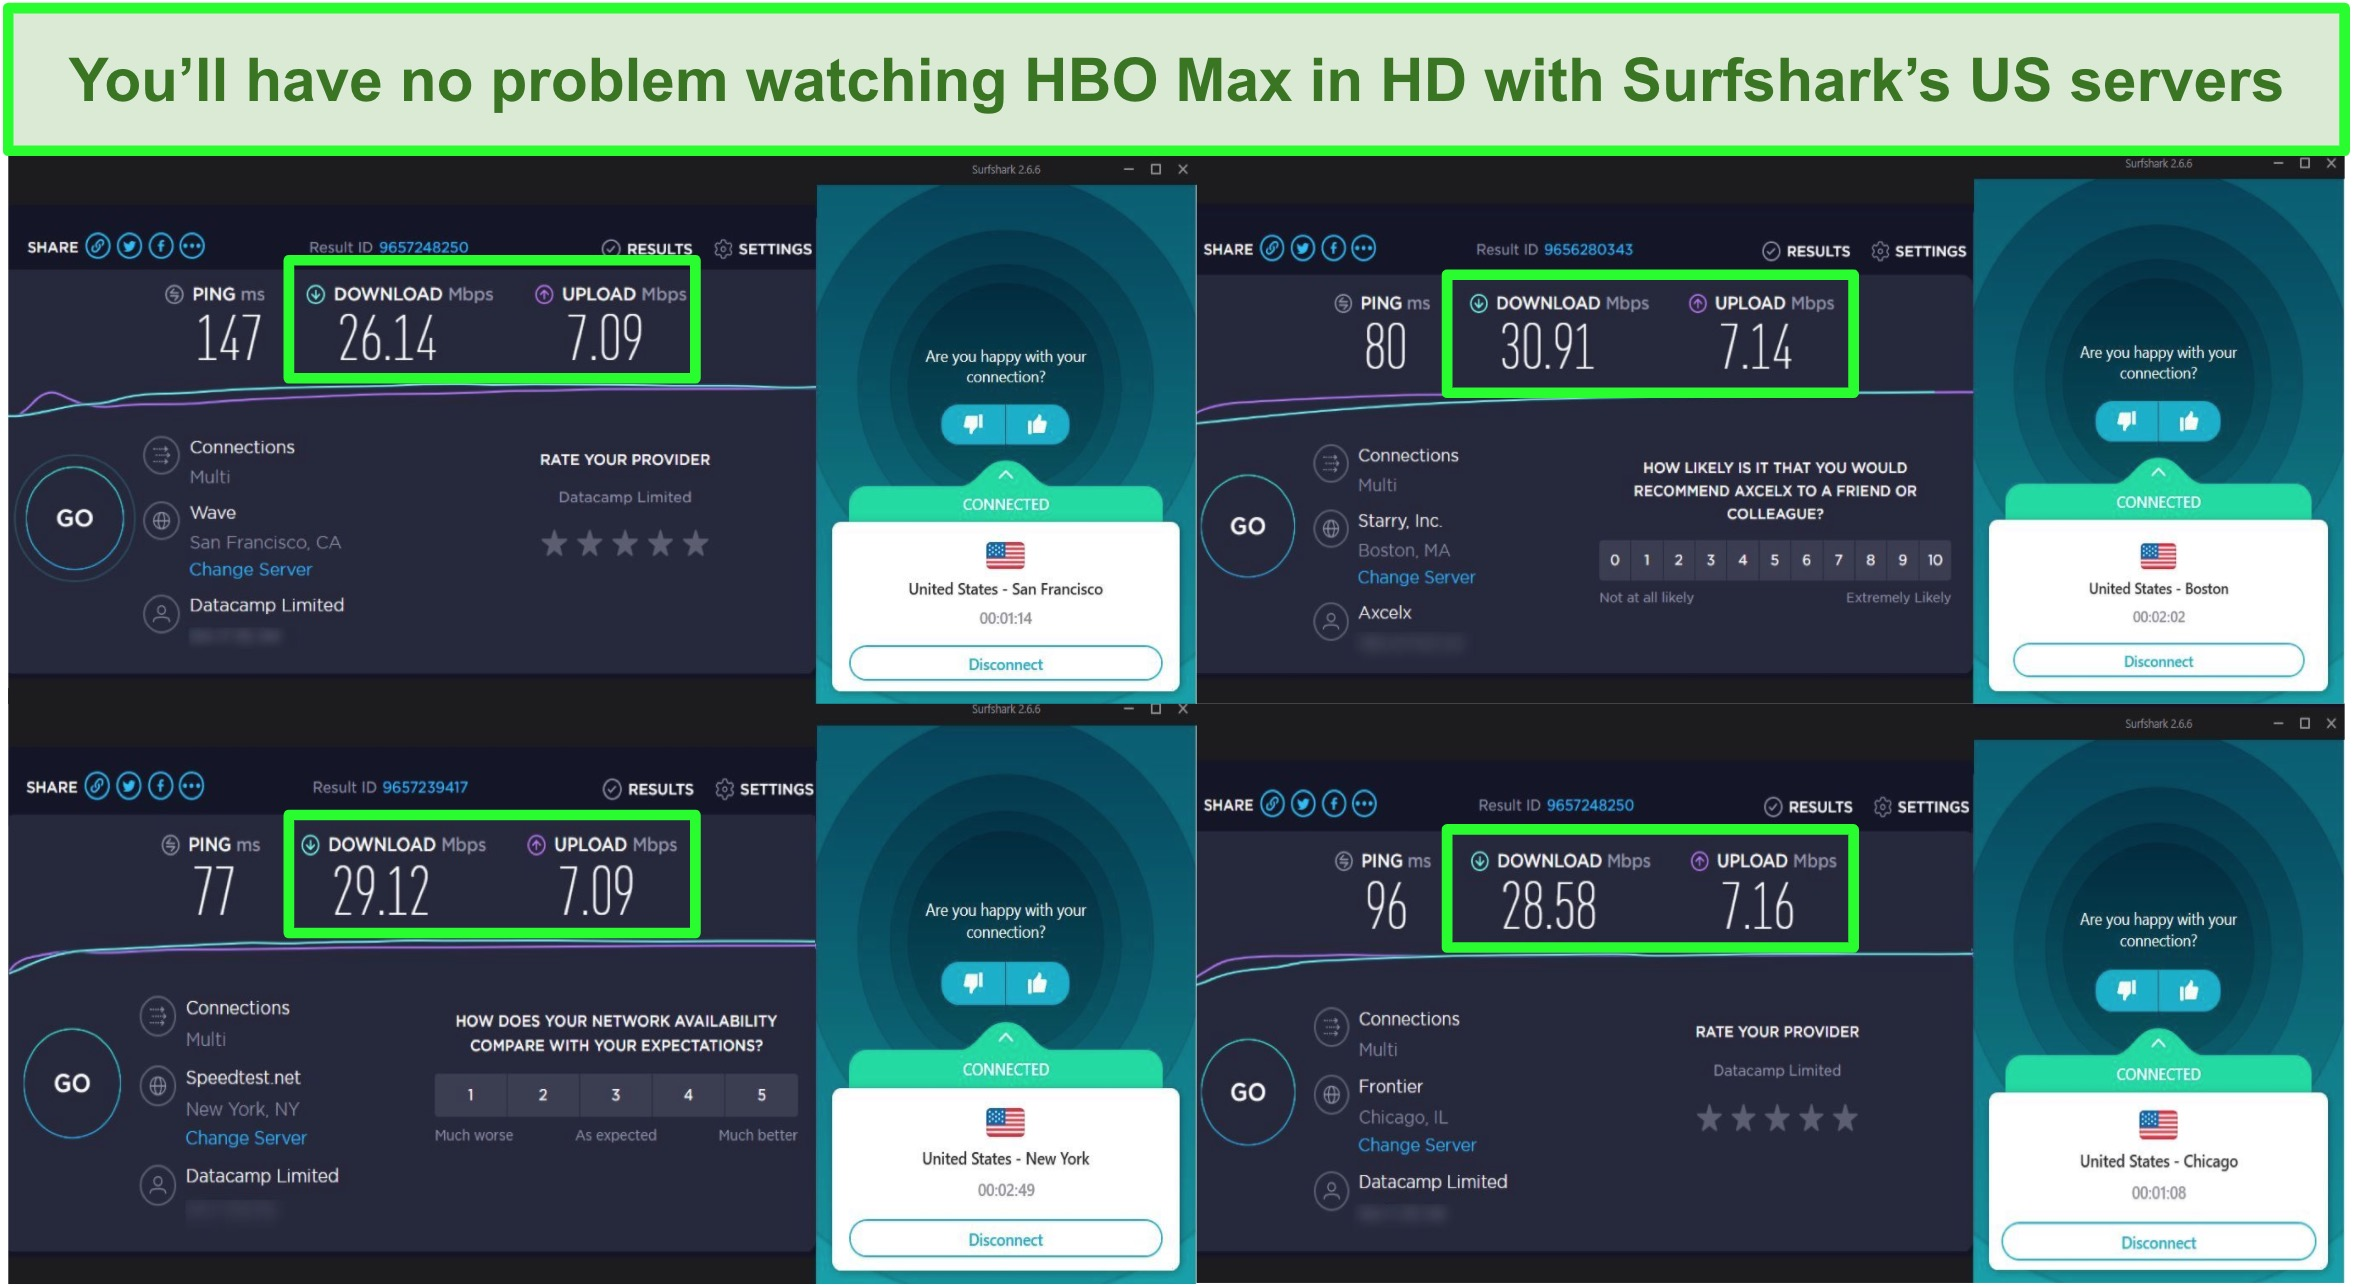 Screenshot of speed tests with Surfshark's US servers